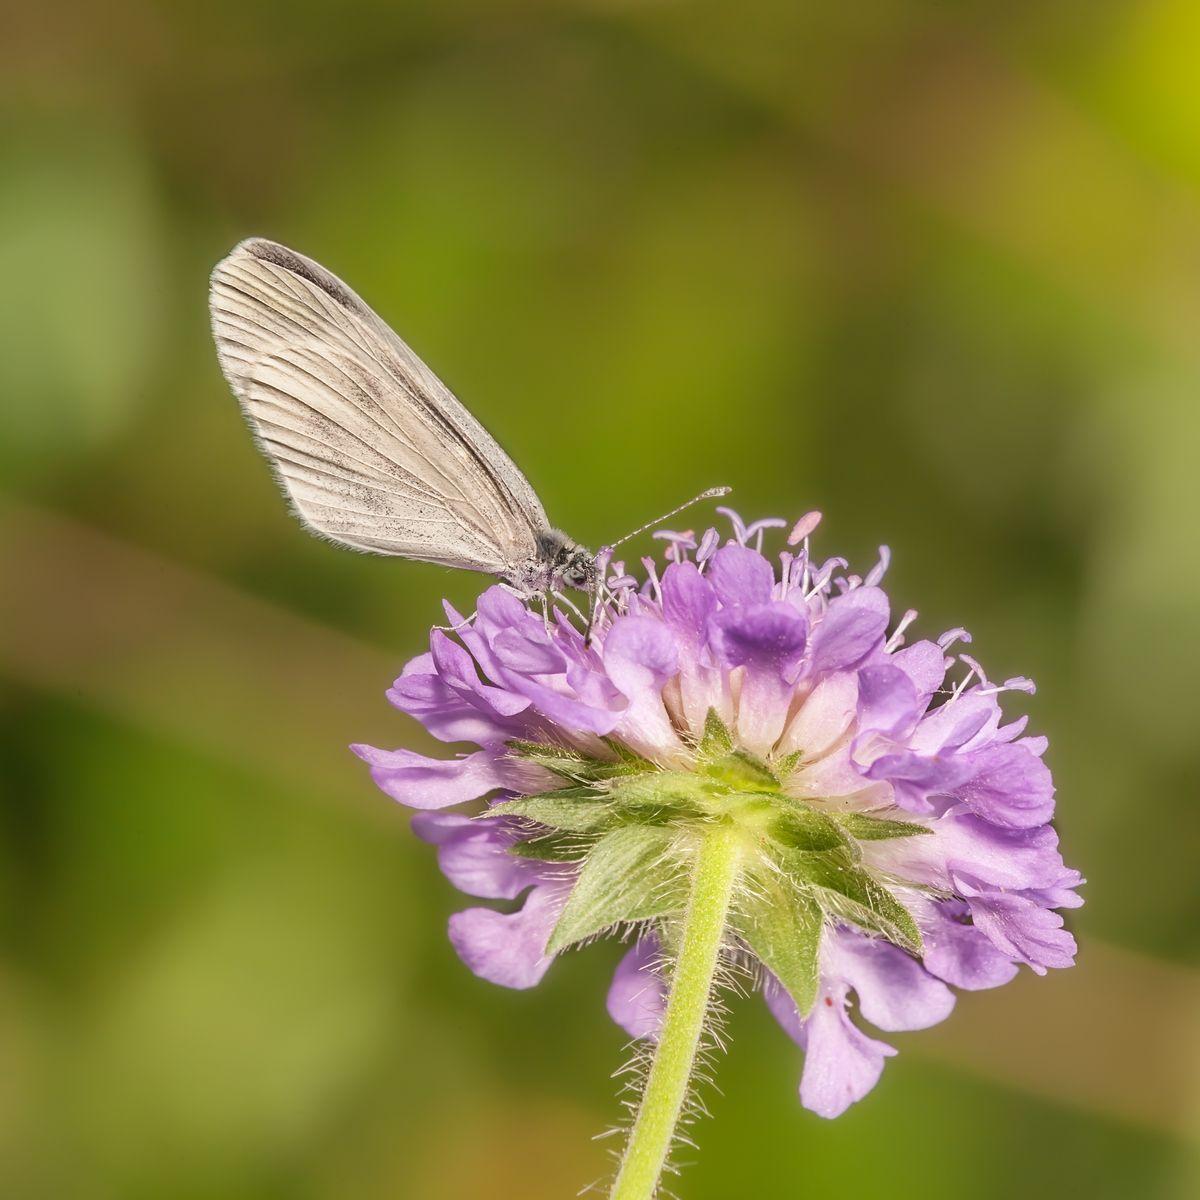 Натюрморт с цветком и бабочкой Макро бабочка фото бабочки